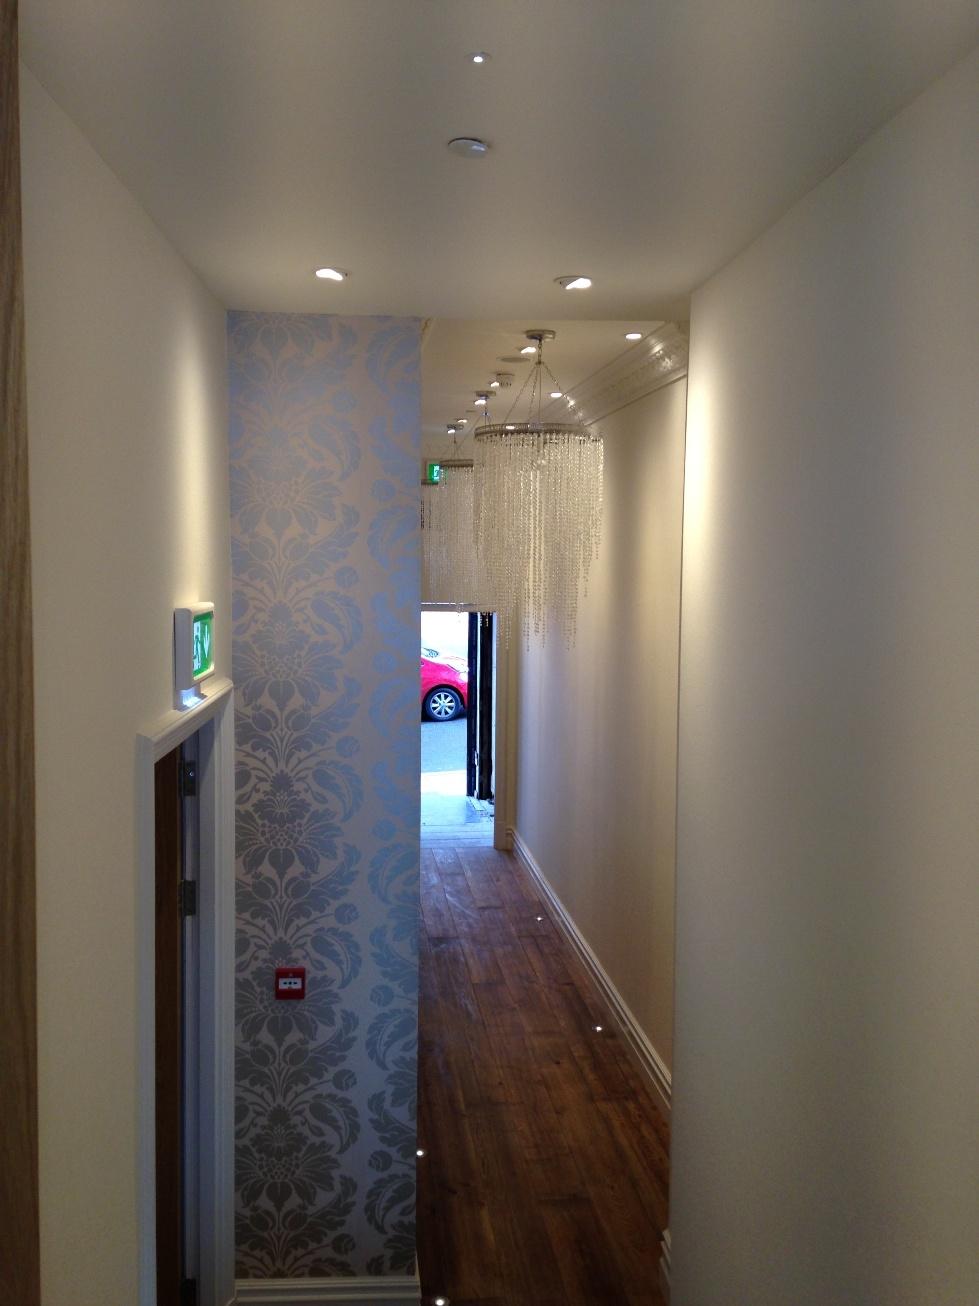 Sands Hotel Margate hallway